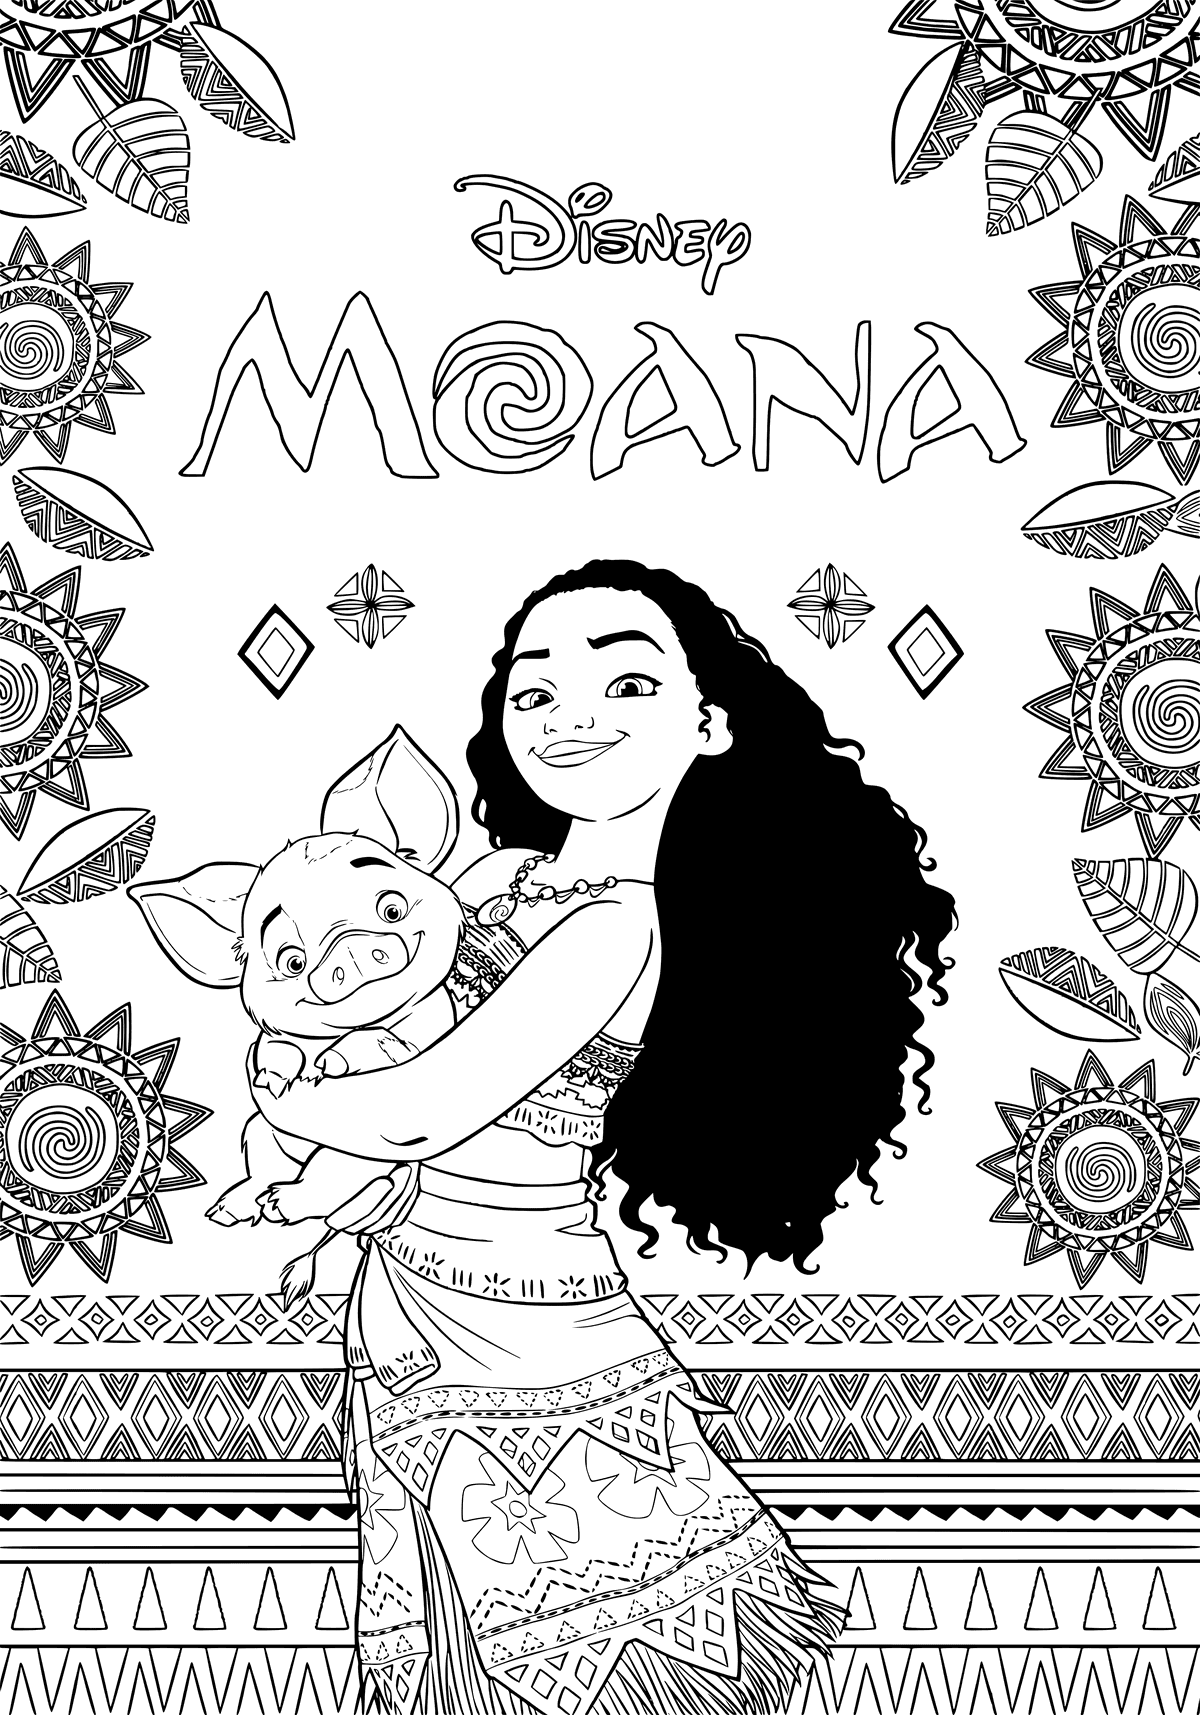 print moana coloring pages princess moana coloring page free printable coloring pages print pages moana coloring